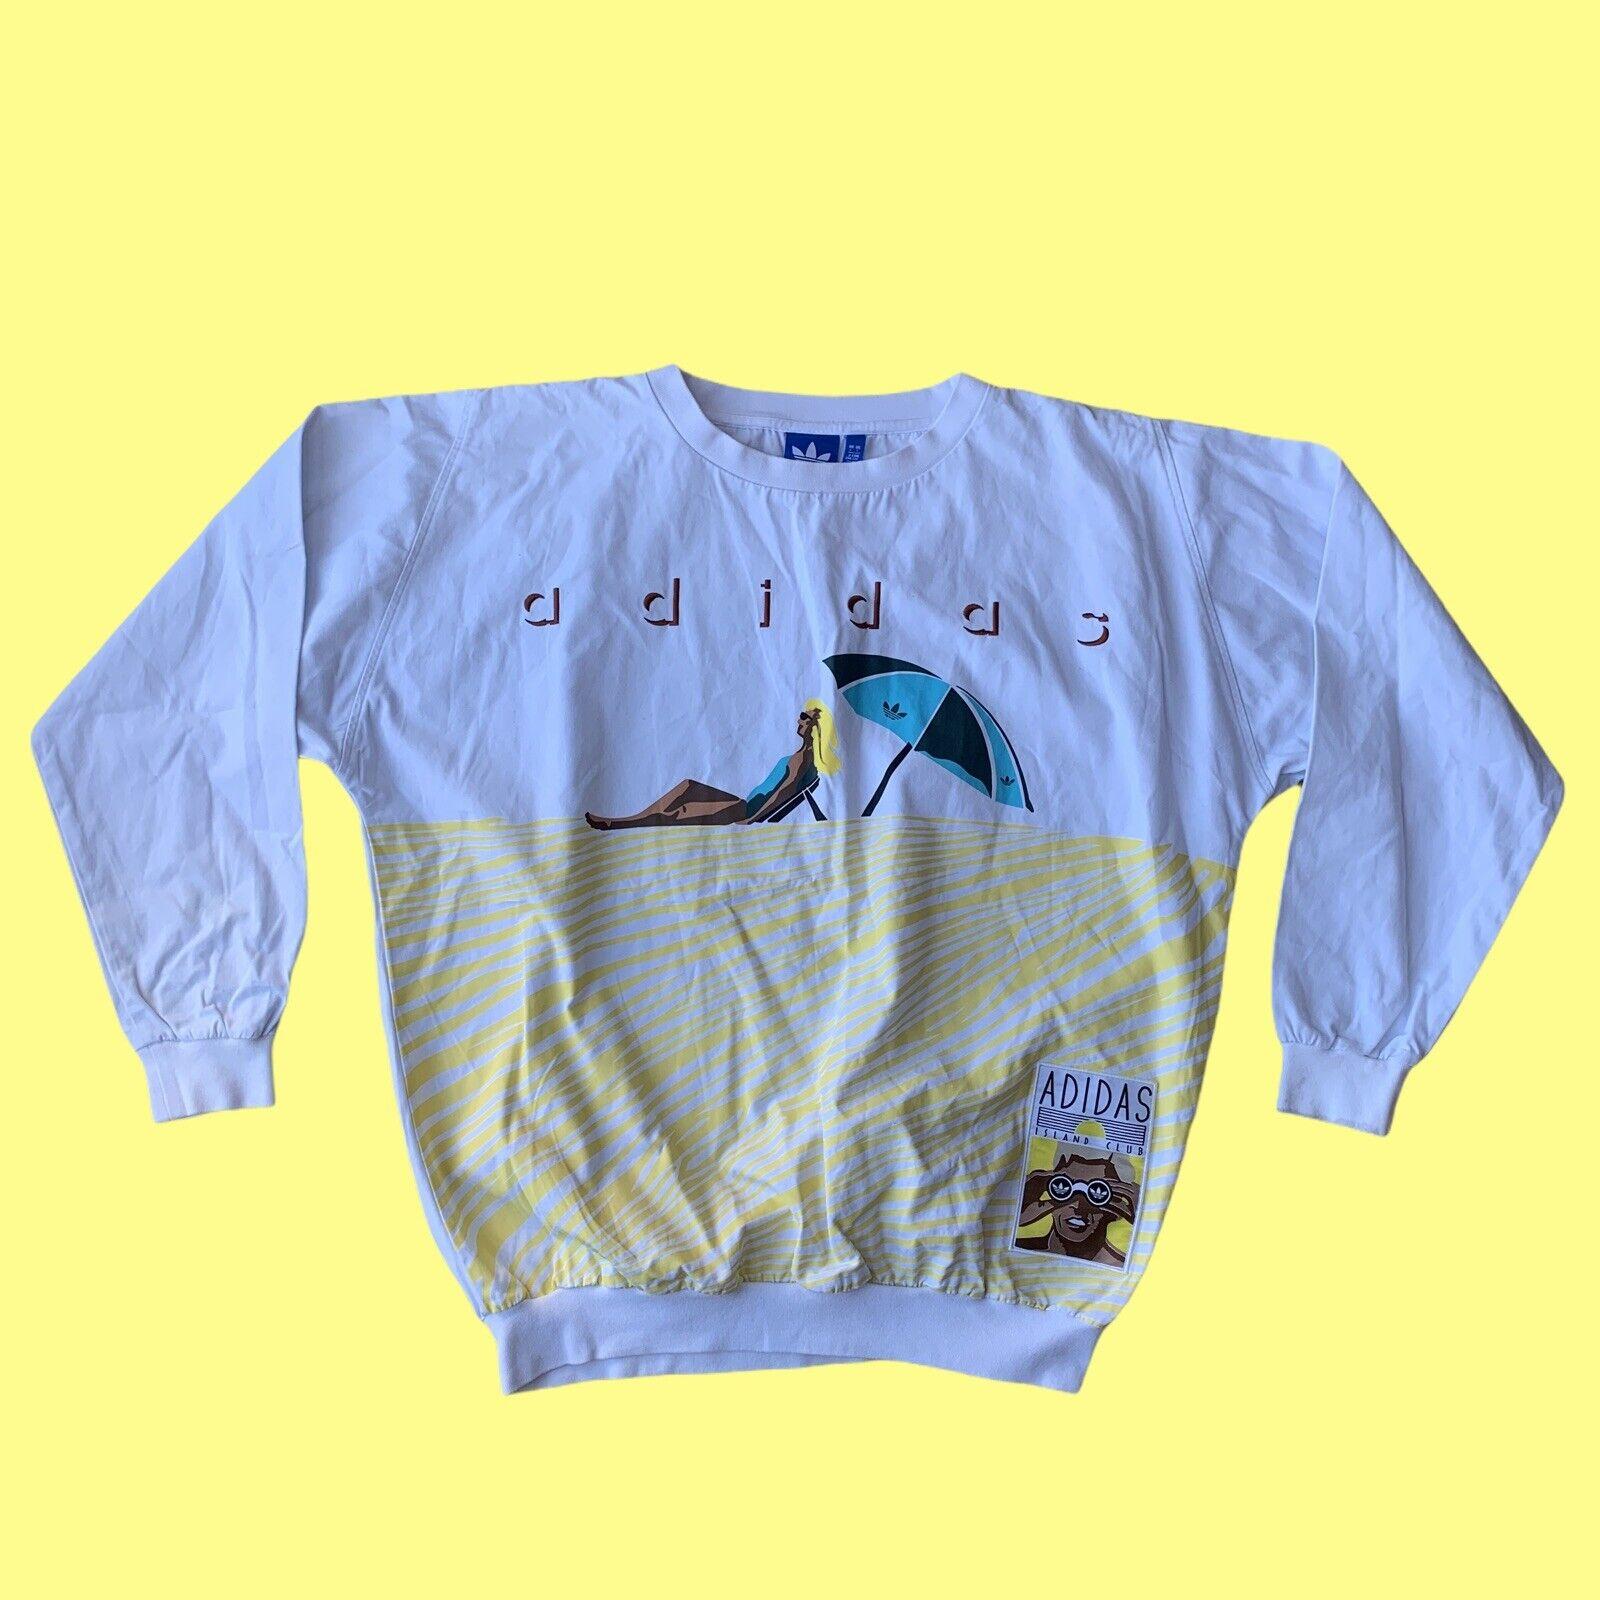 Adidas Archive Series 1988 Island Club Pullover Jumper